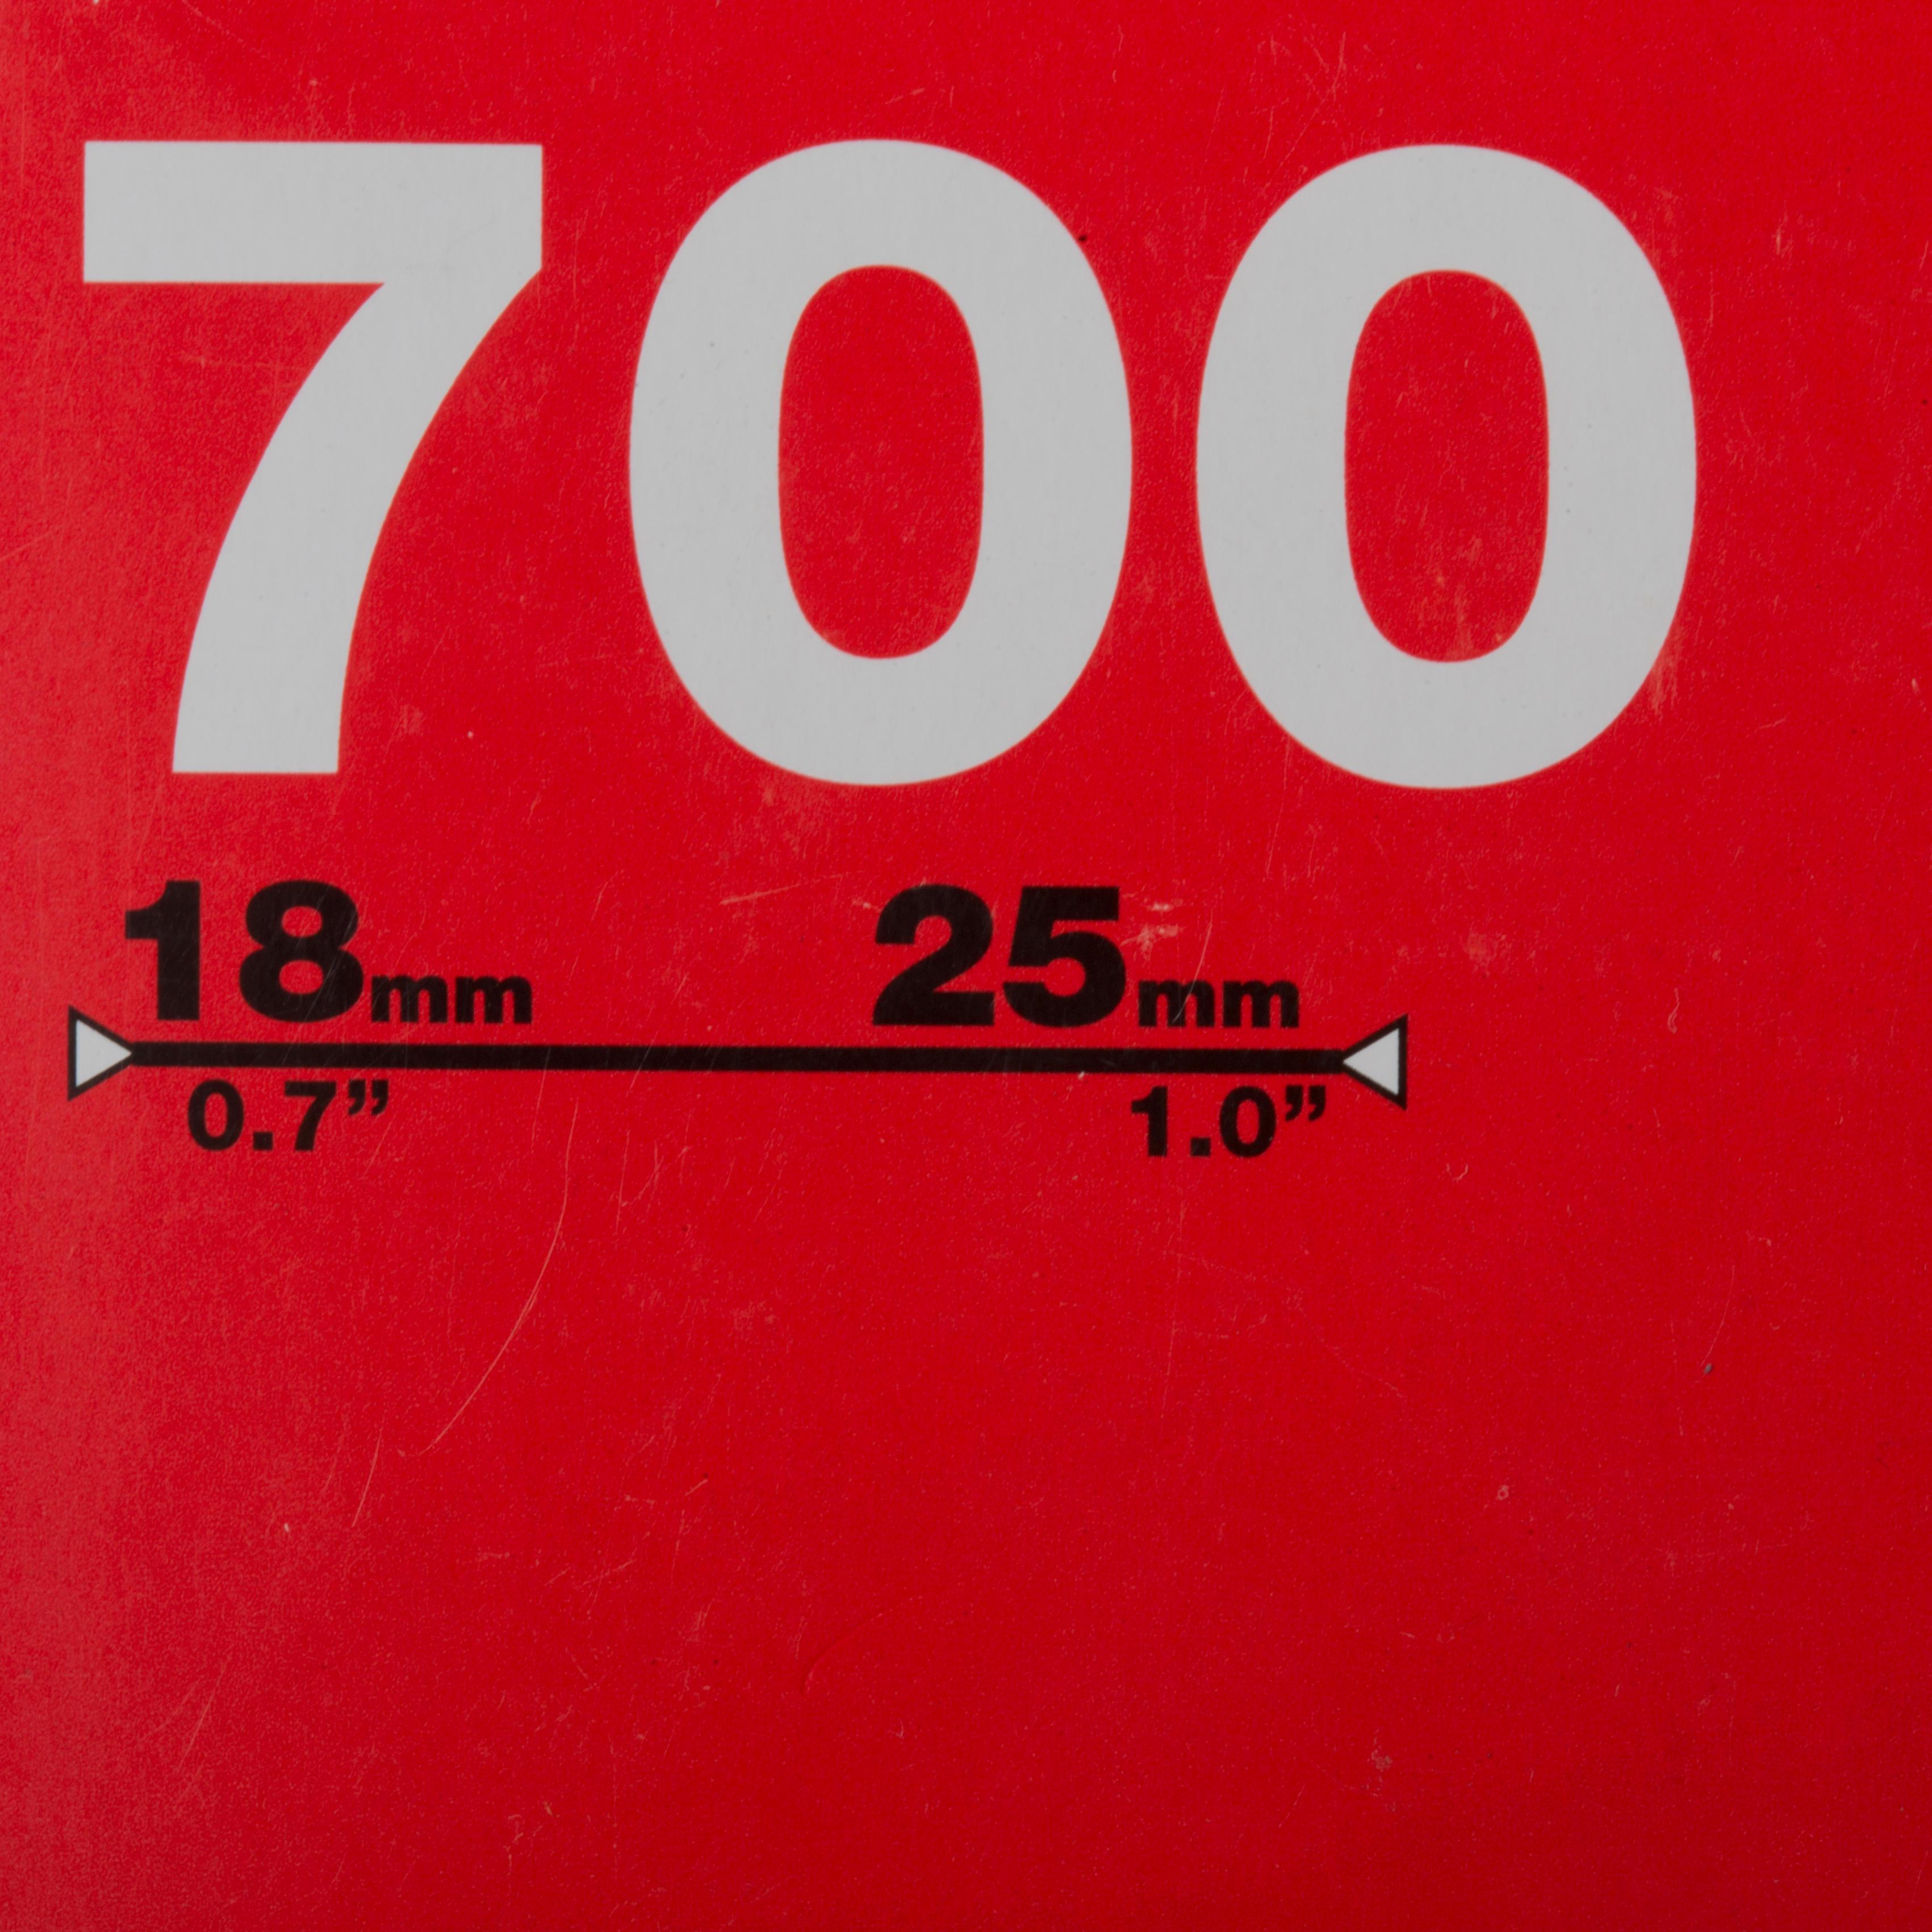 CHAMBRE À AIR 700x18/25 VALVE PRESTA 80 MM